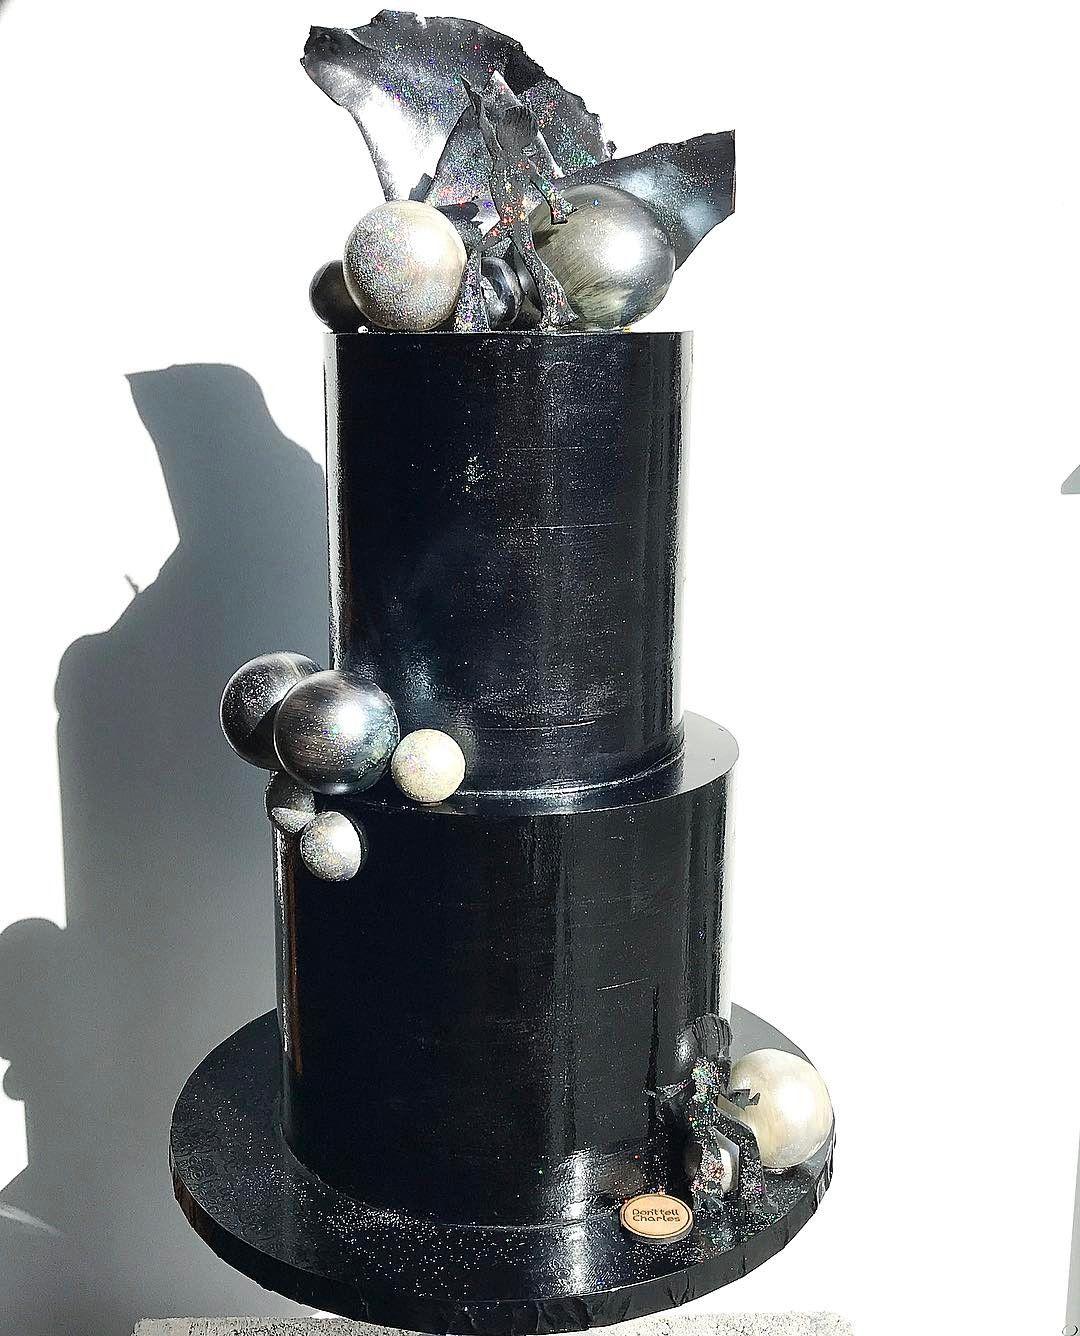 Don't Tell Charles. Shiny Black Cake